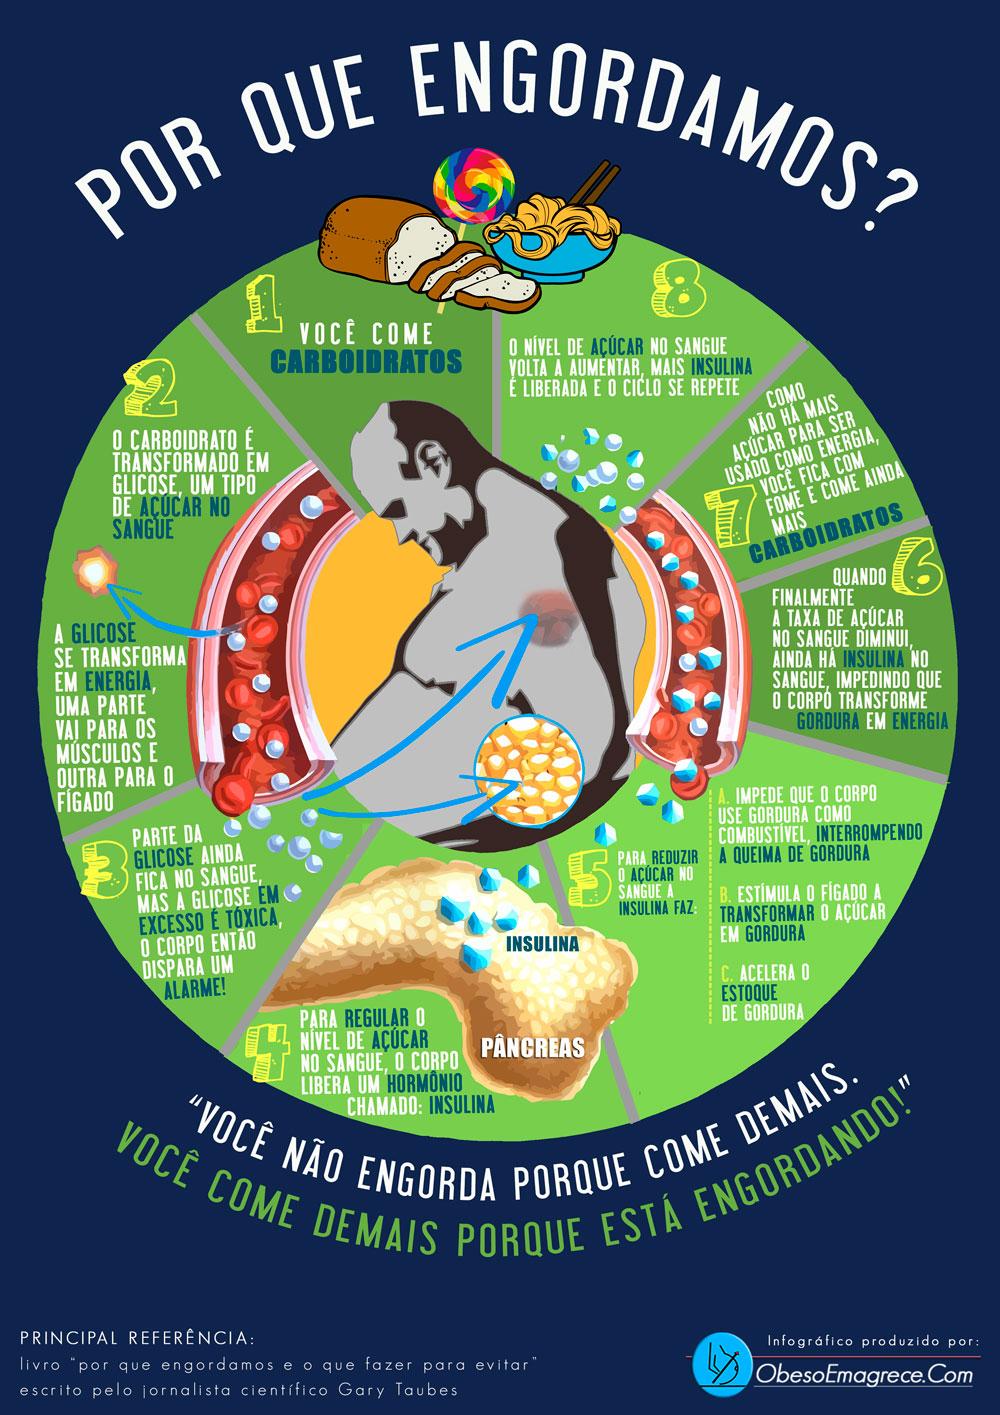 Low carb é para todos? | infográfico representando que explica o ciclo vicioso da fome e o porque engordamos baseado no livro de Gary Taubes